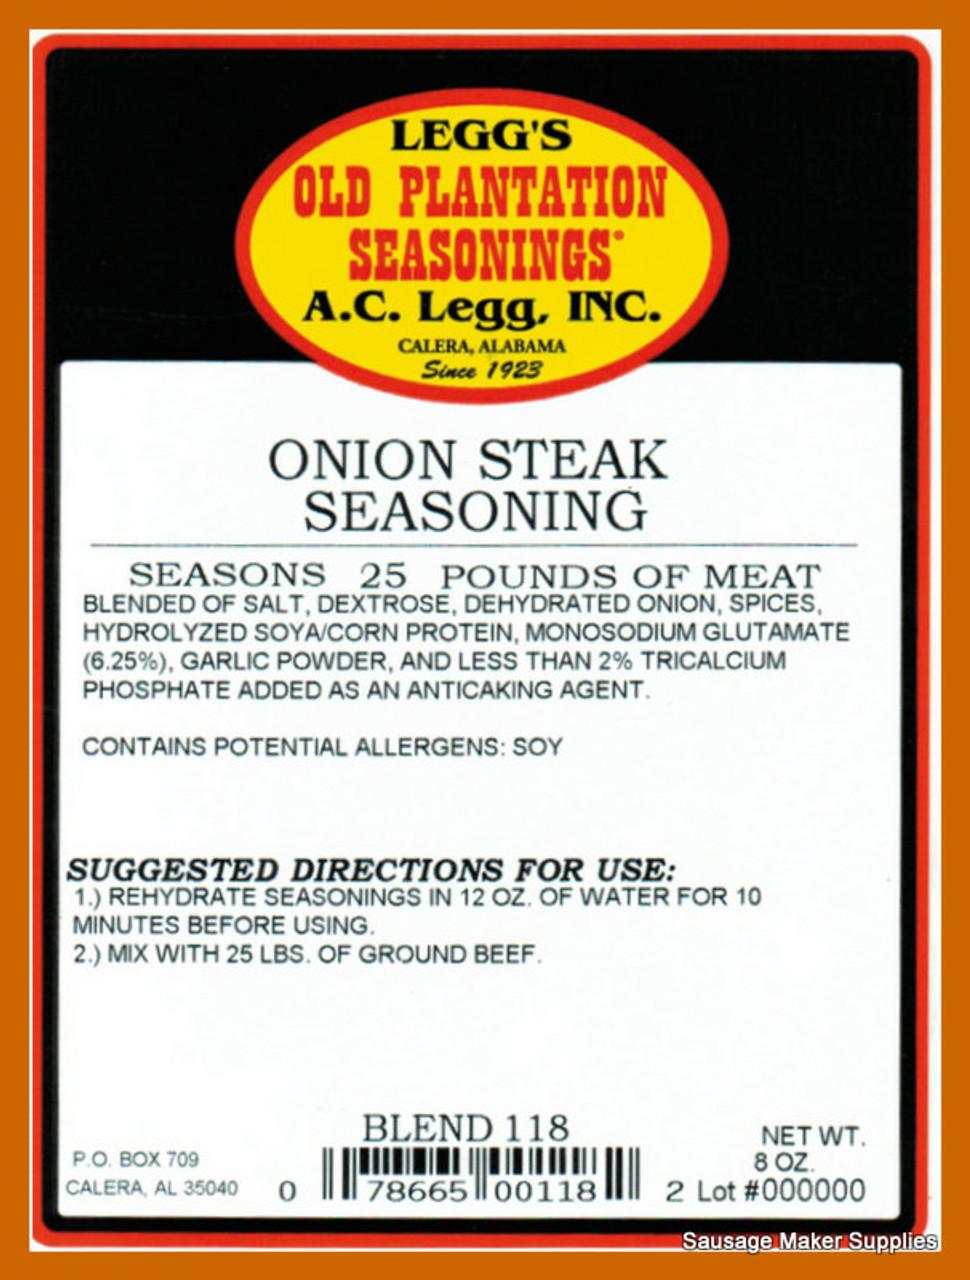 A.C. LEGGS OLD PLANTATION Onion Steak Blend 118